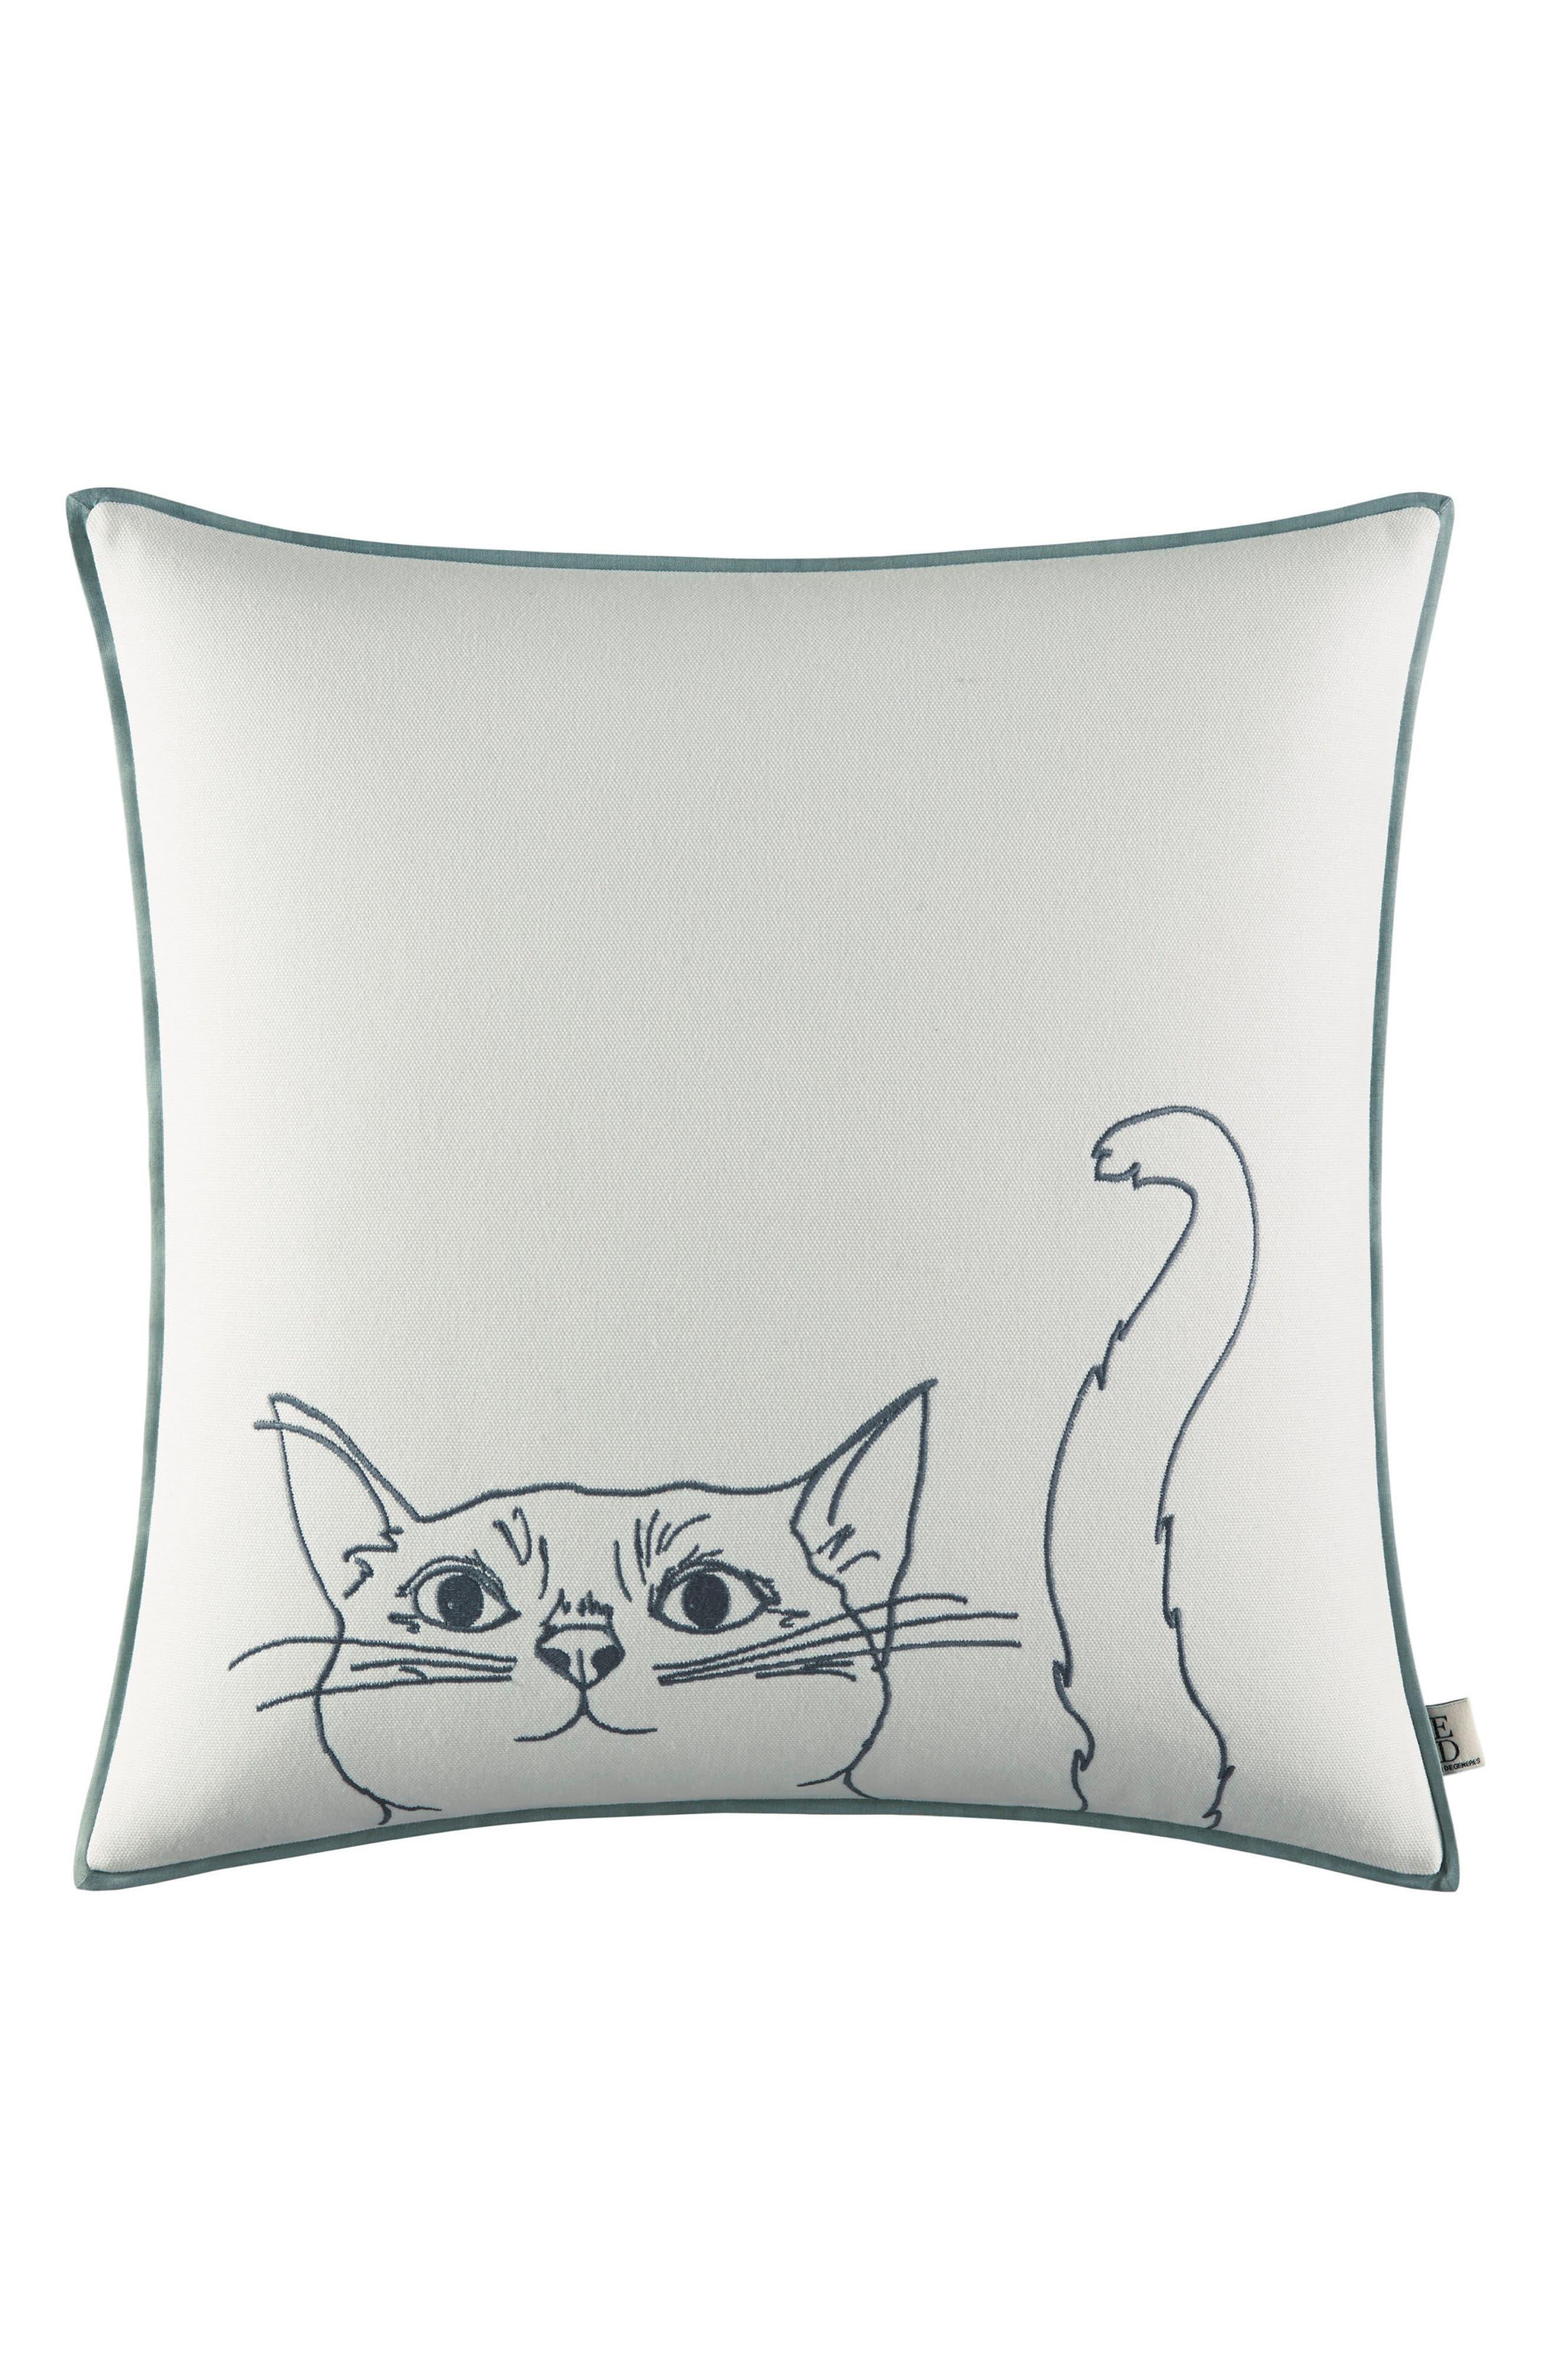 Cat Pillow,                             Main thumbnail 1, color,                             White